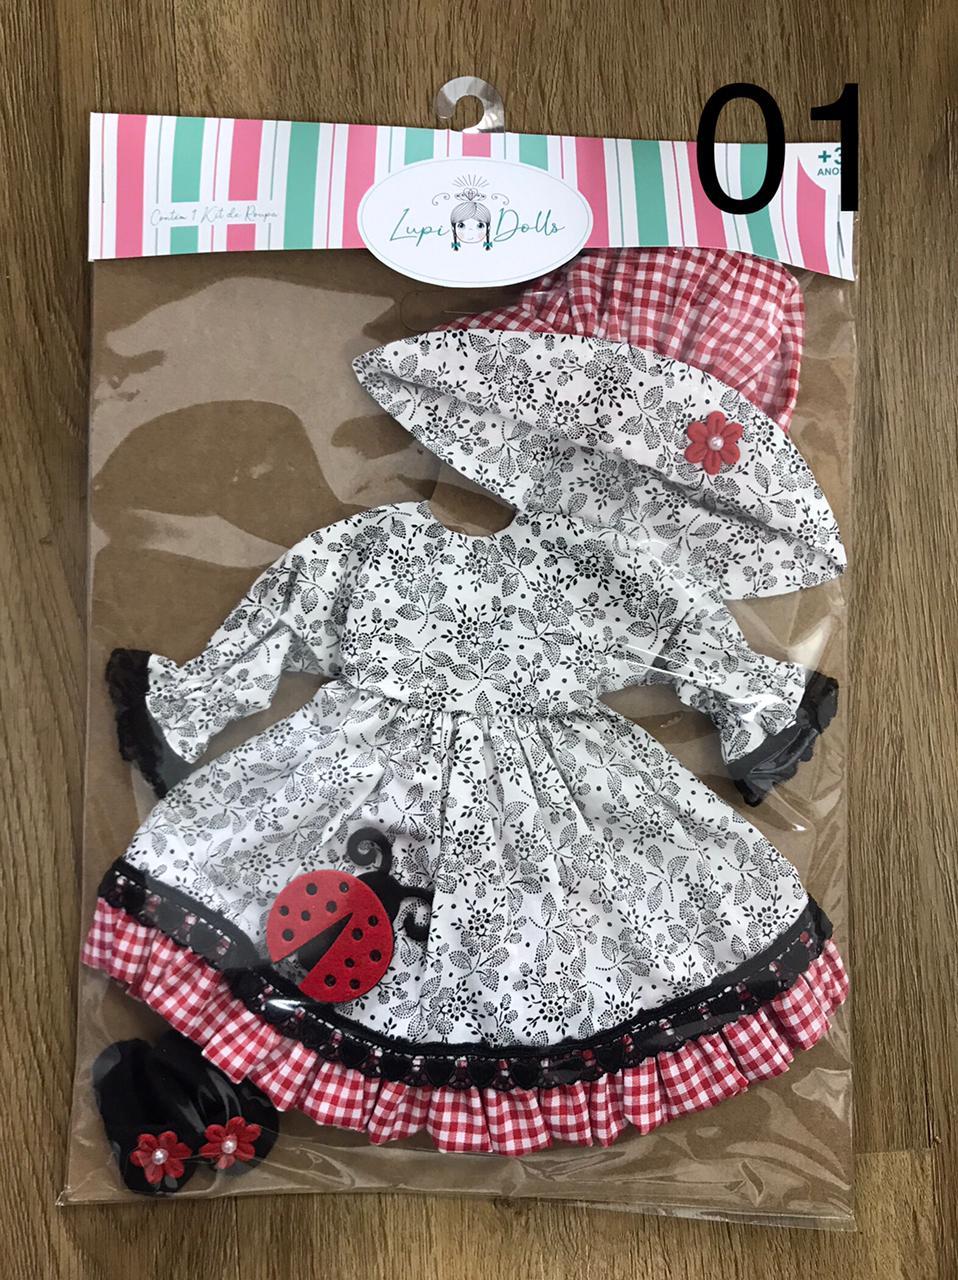 Roupa Lupi Dolls 1